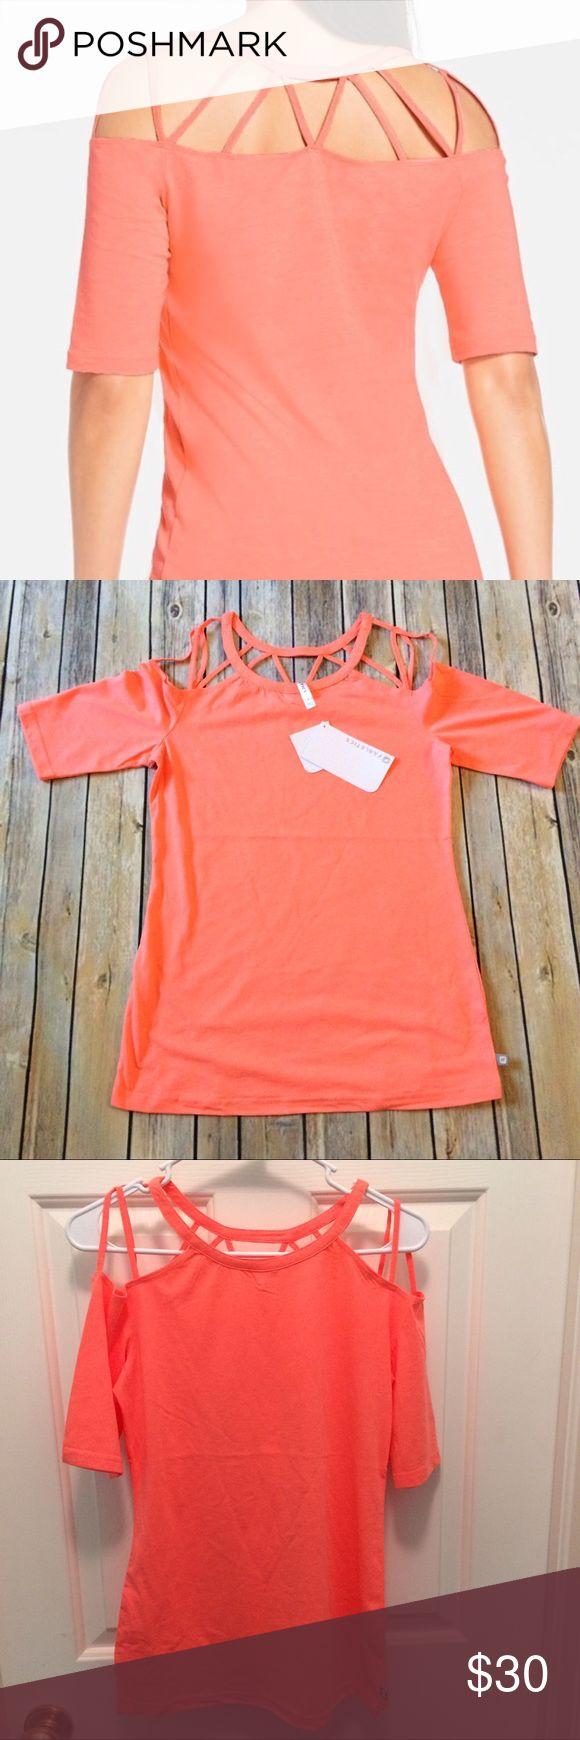 Fabletics top Brand New! Bright coral orange  strappy top. Fabletics Tops